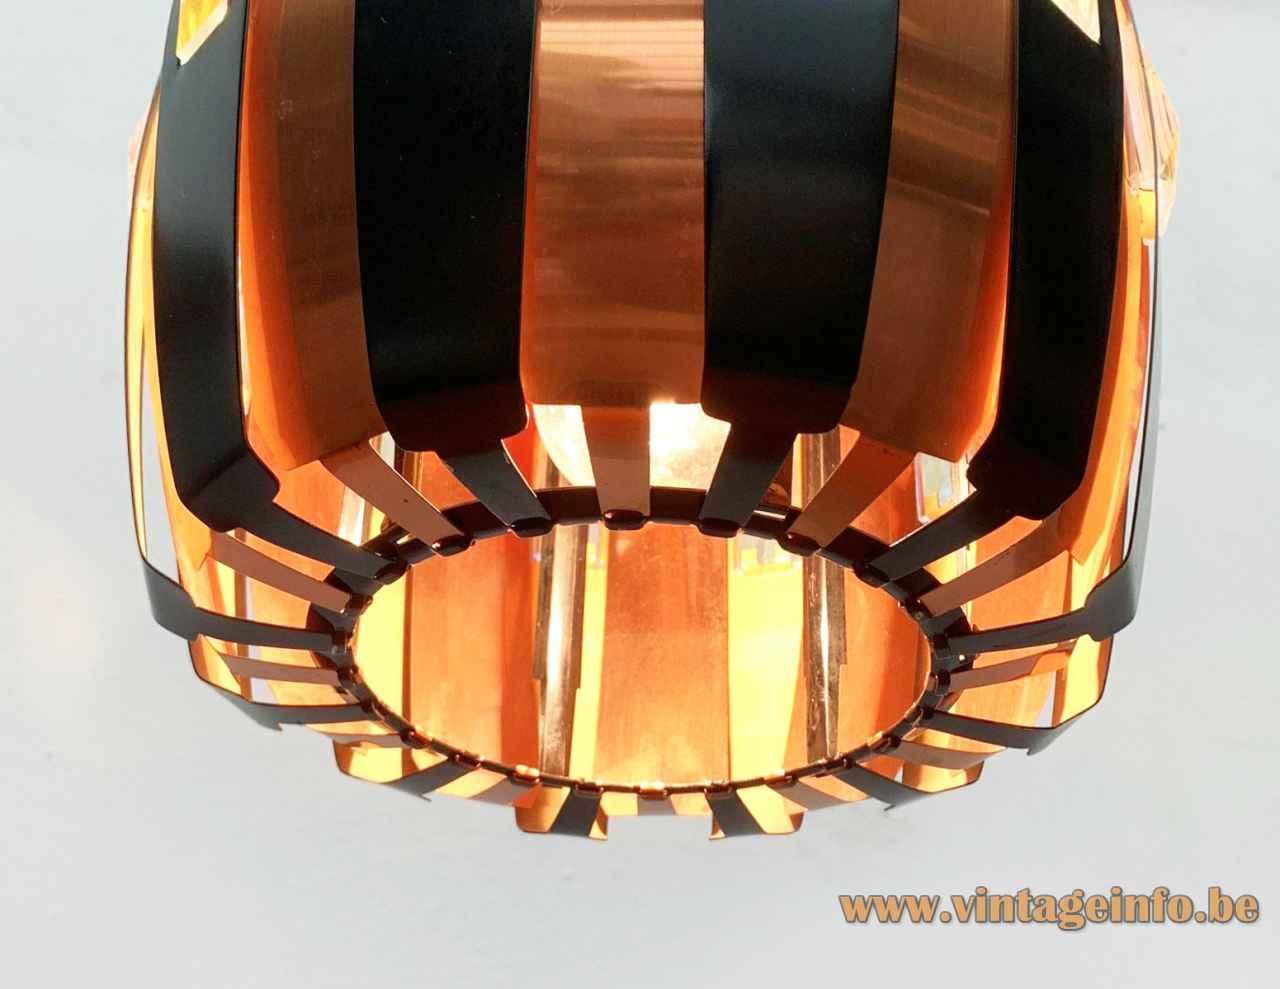 Coronell Elektro copper pendant lamp black convex folded slats lampshade 1960s design: Werner Schou bottom view